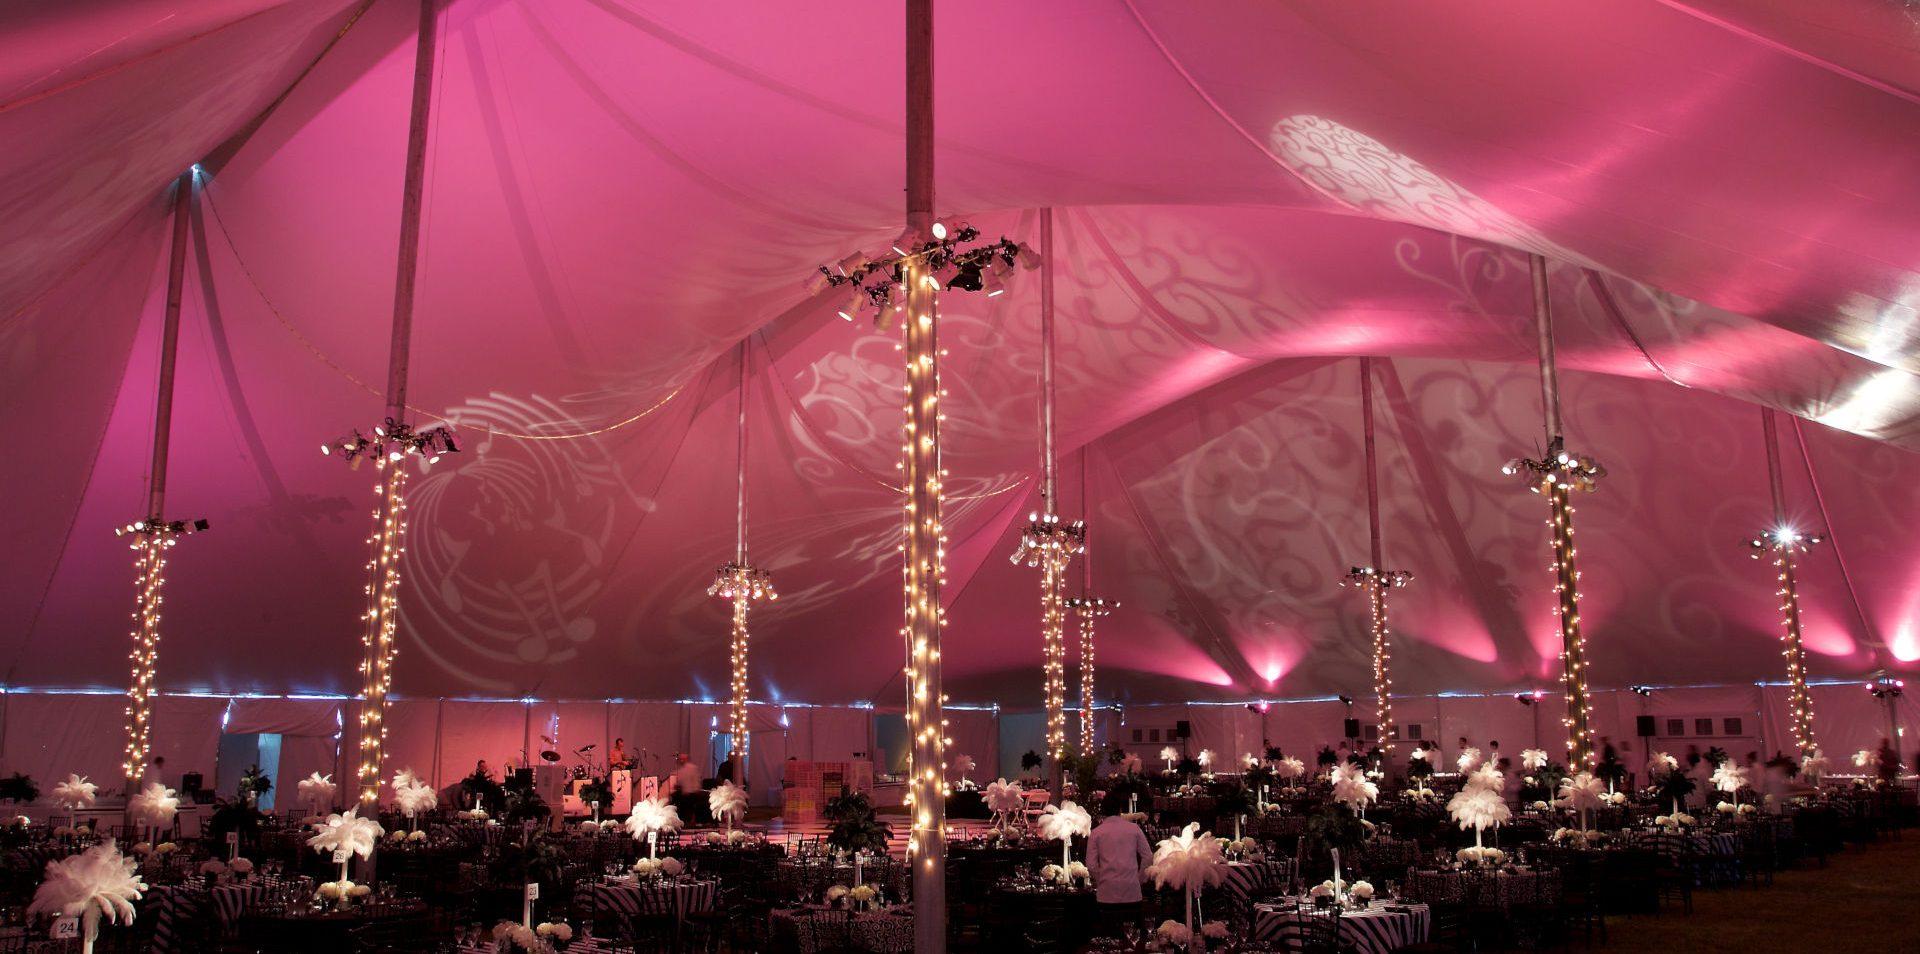 Benefits, Fundraisers & Galas